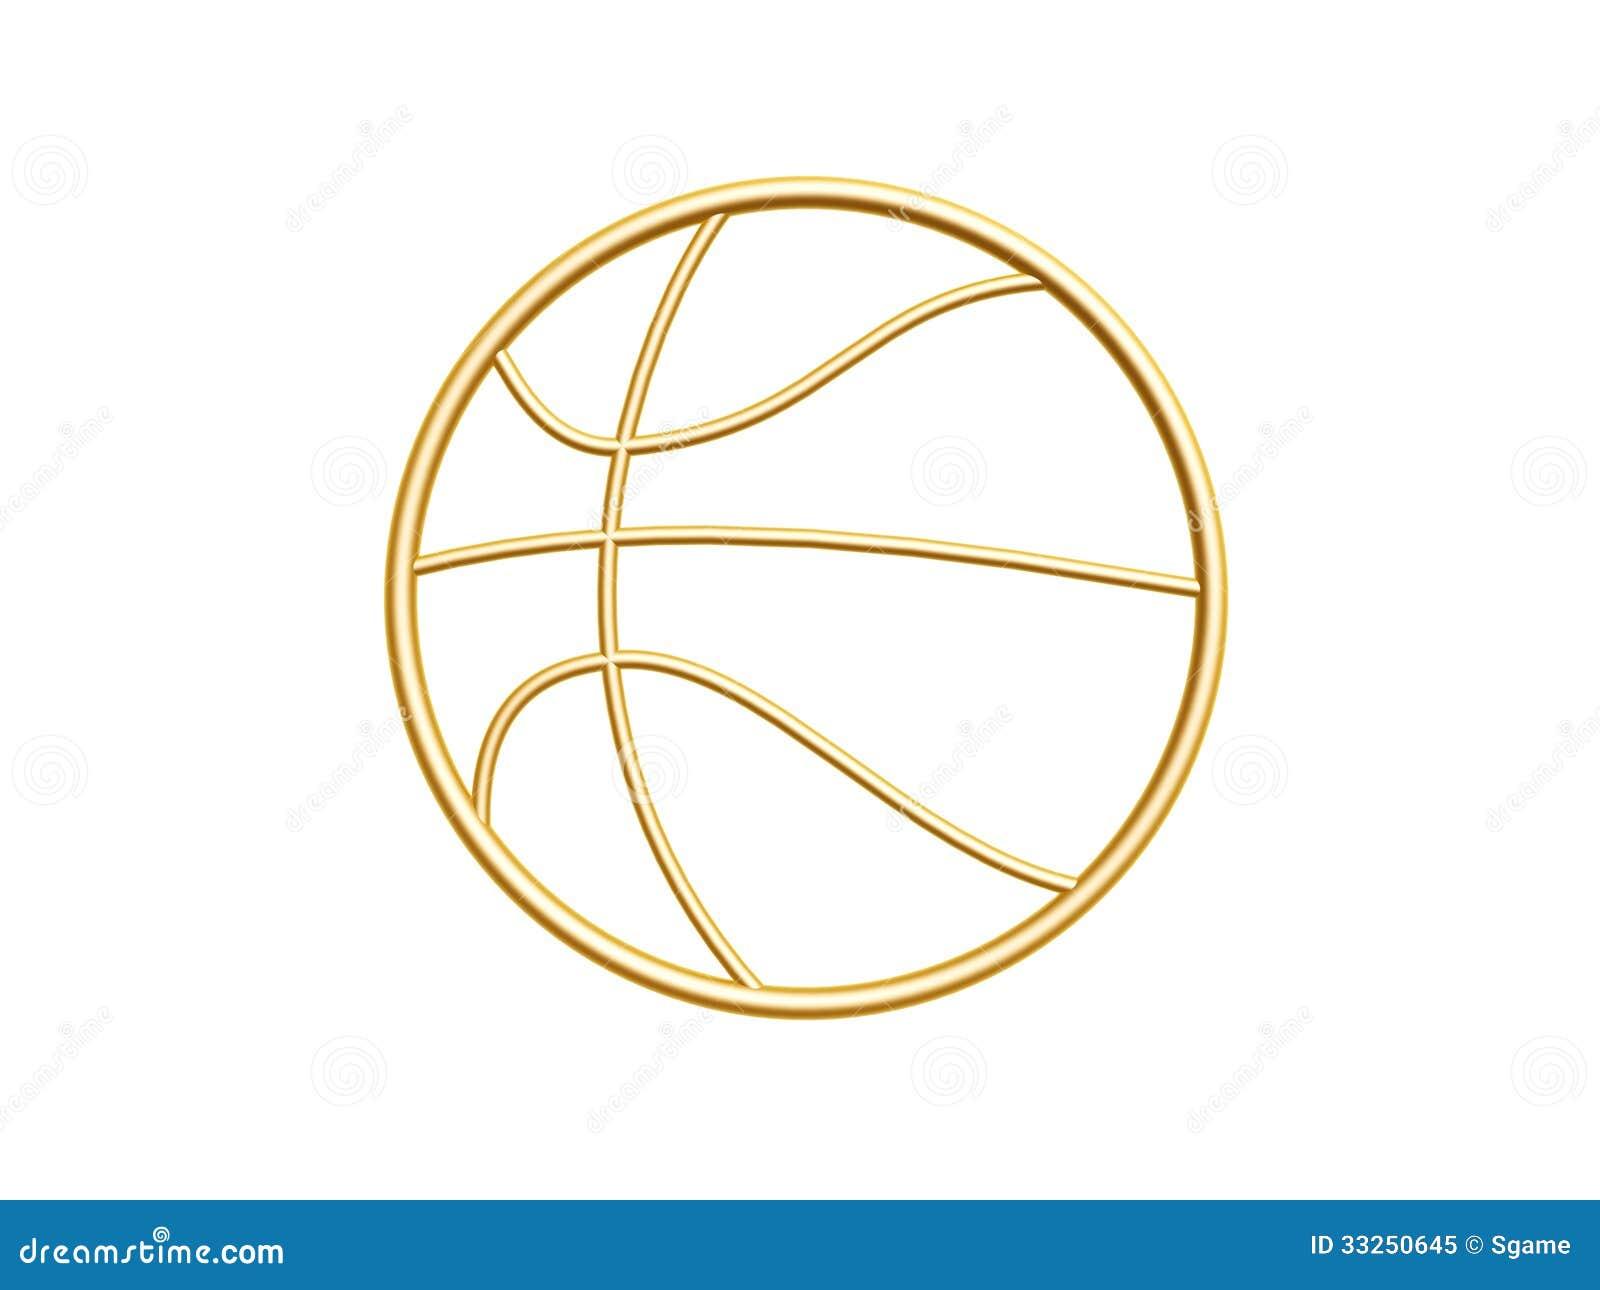 golden basketball symbol royalty free stock photo image